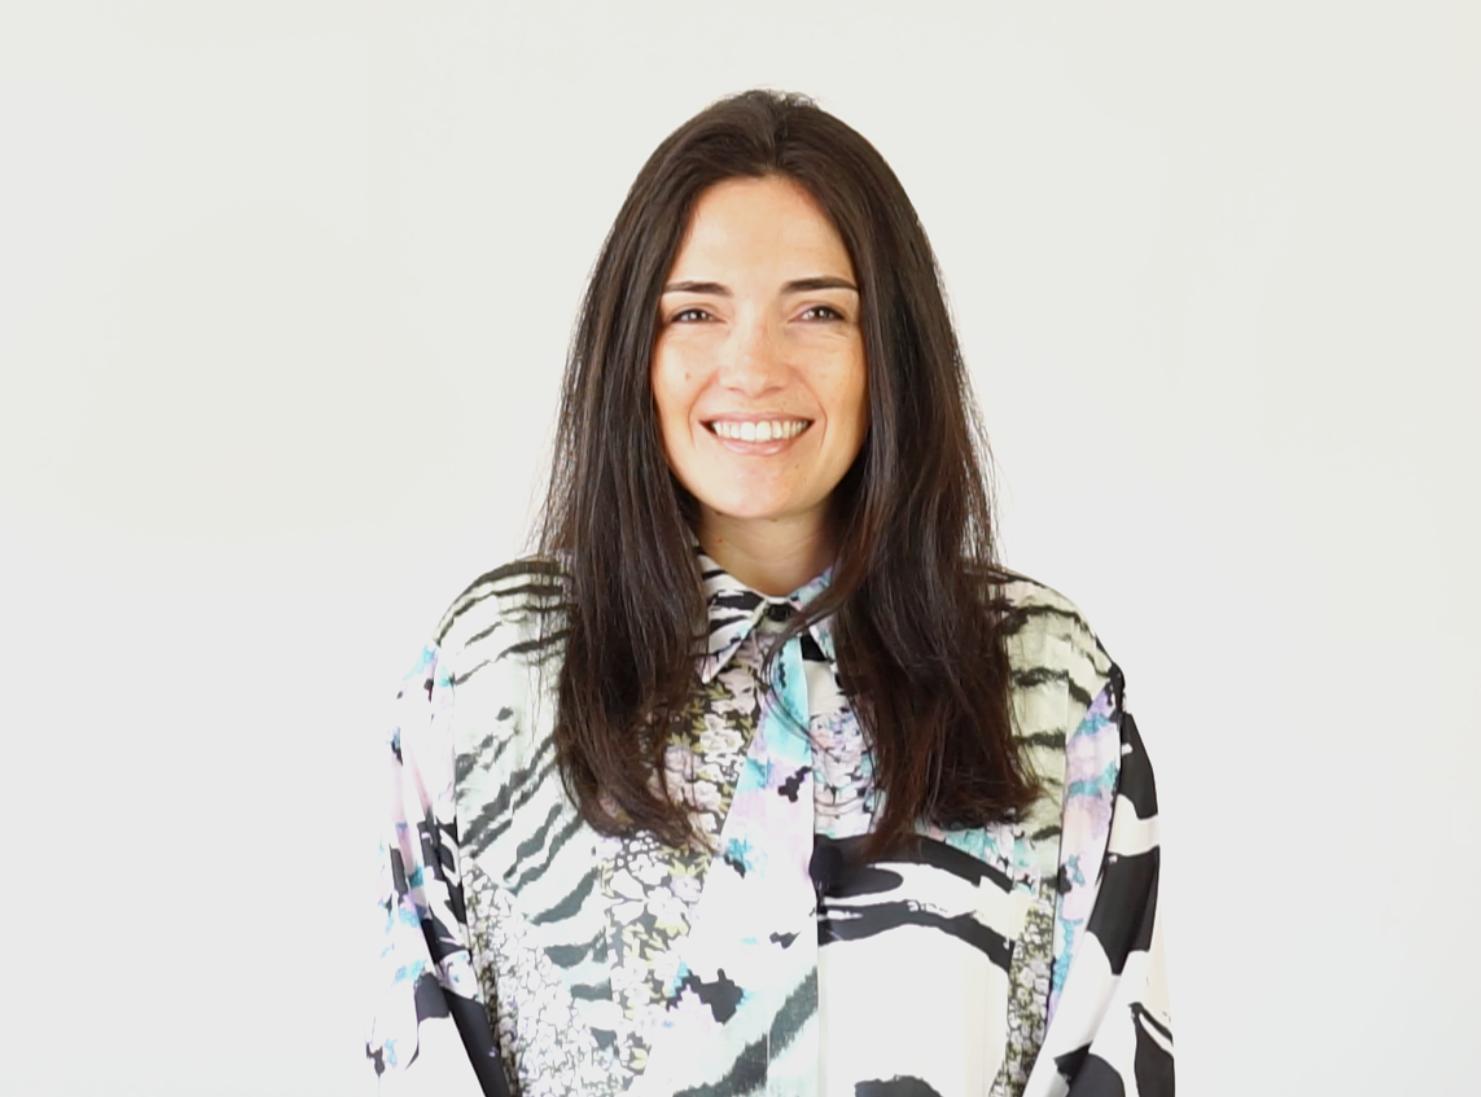 Diana-Paiva-Carvalho-Interior-Designer-visual-merchandiser